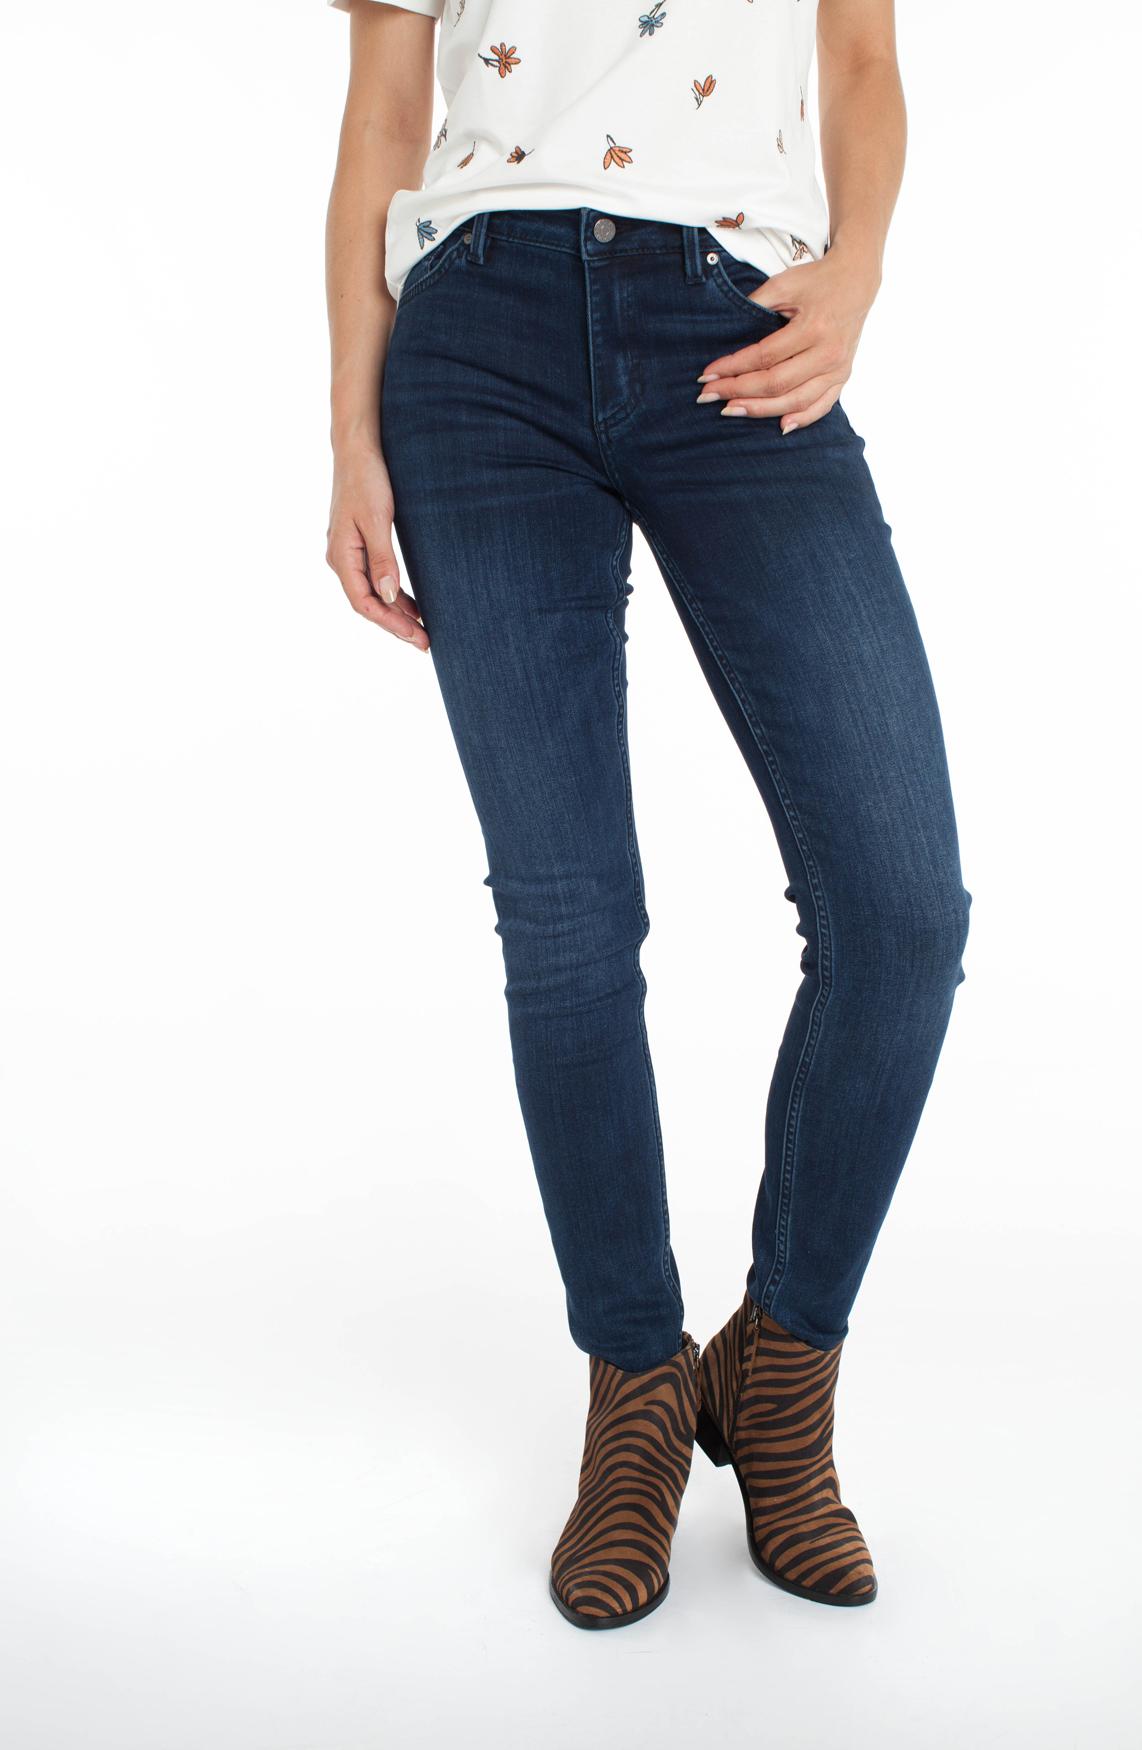 Rosner Dames Antonia mid-waist jeans Blauw